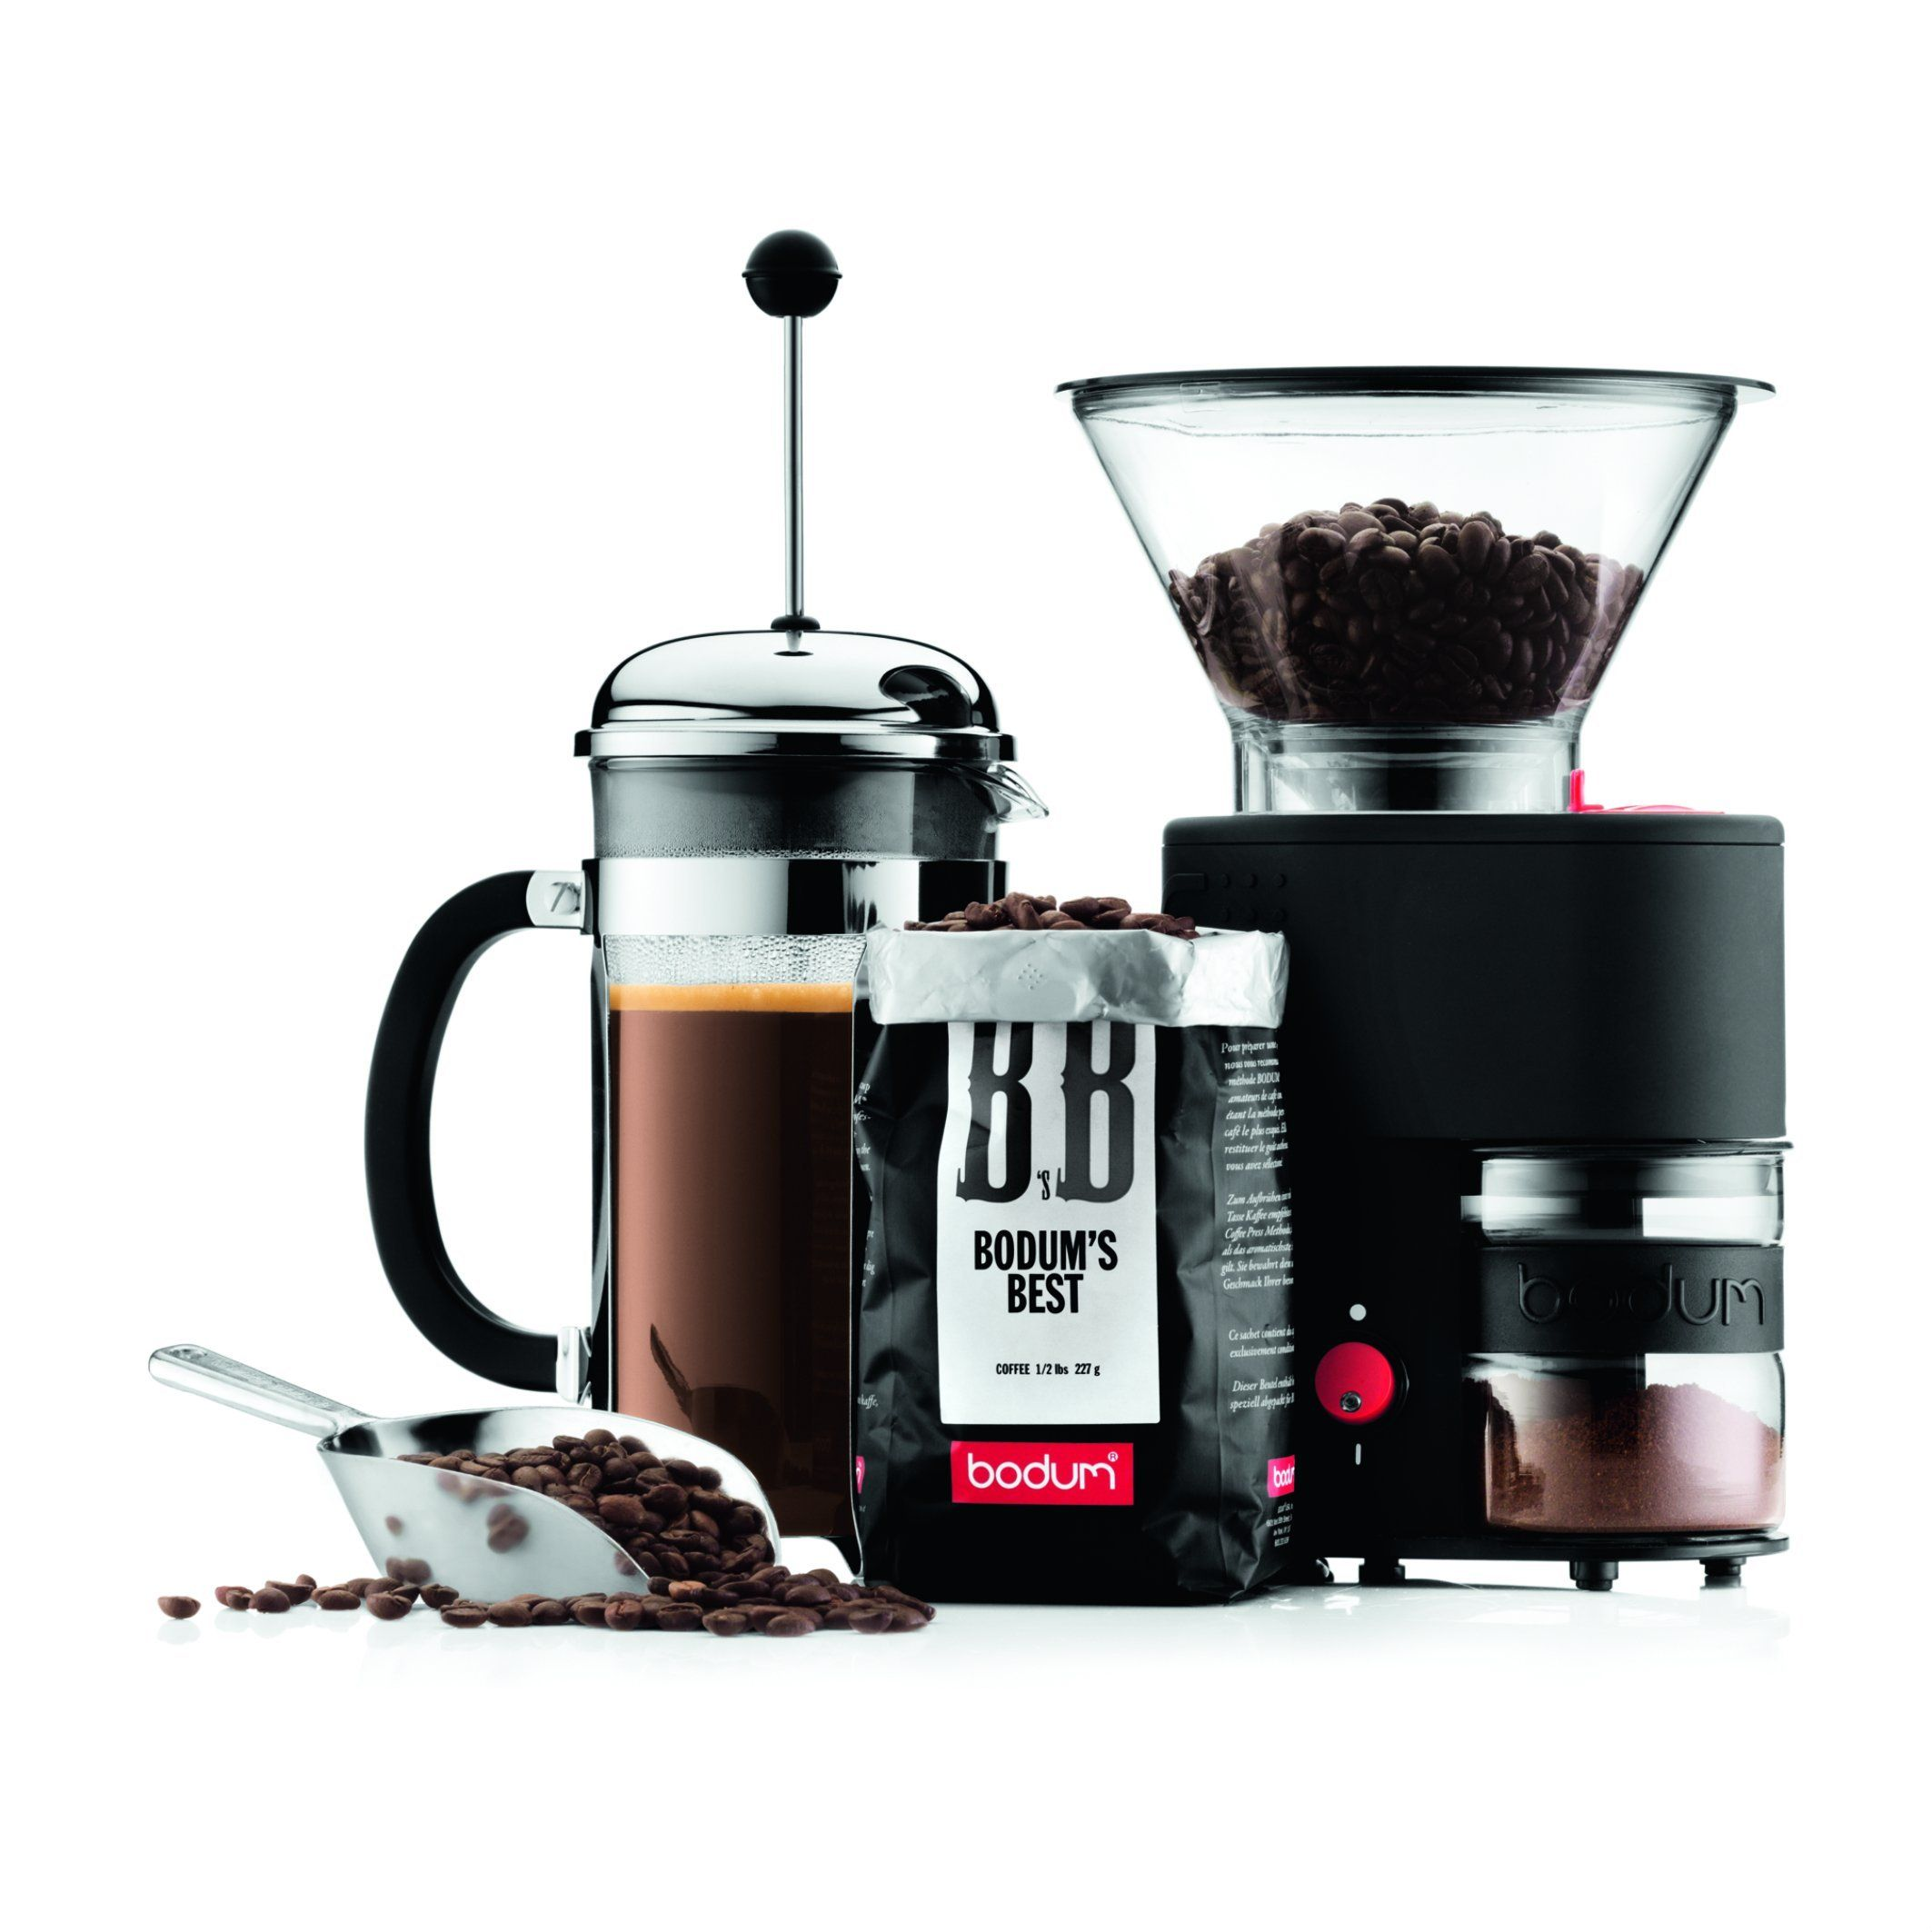 Bodum Bistro Burr Grinder Electronic Coffee Grinder with